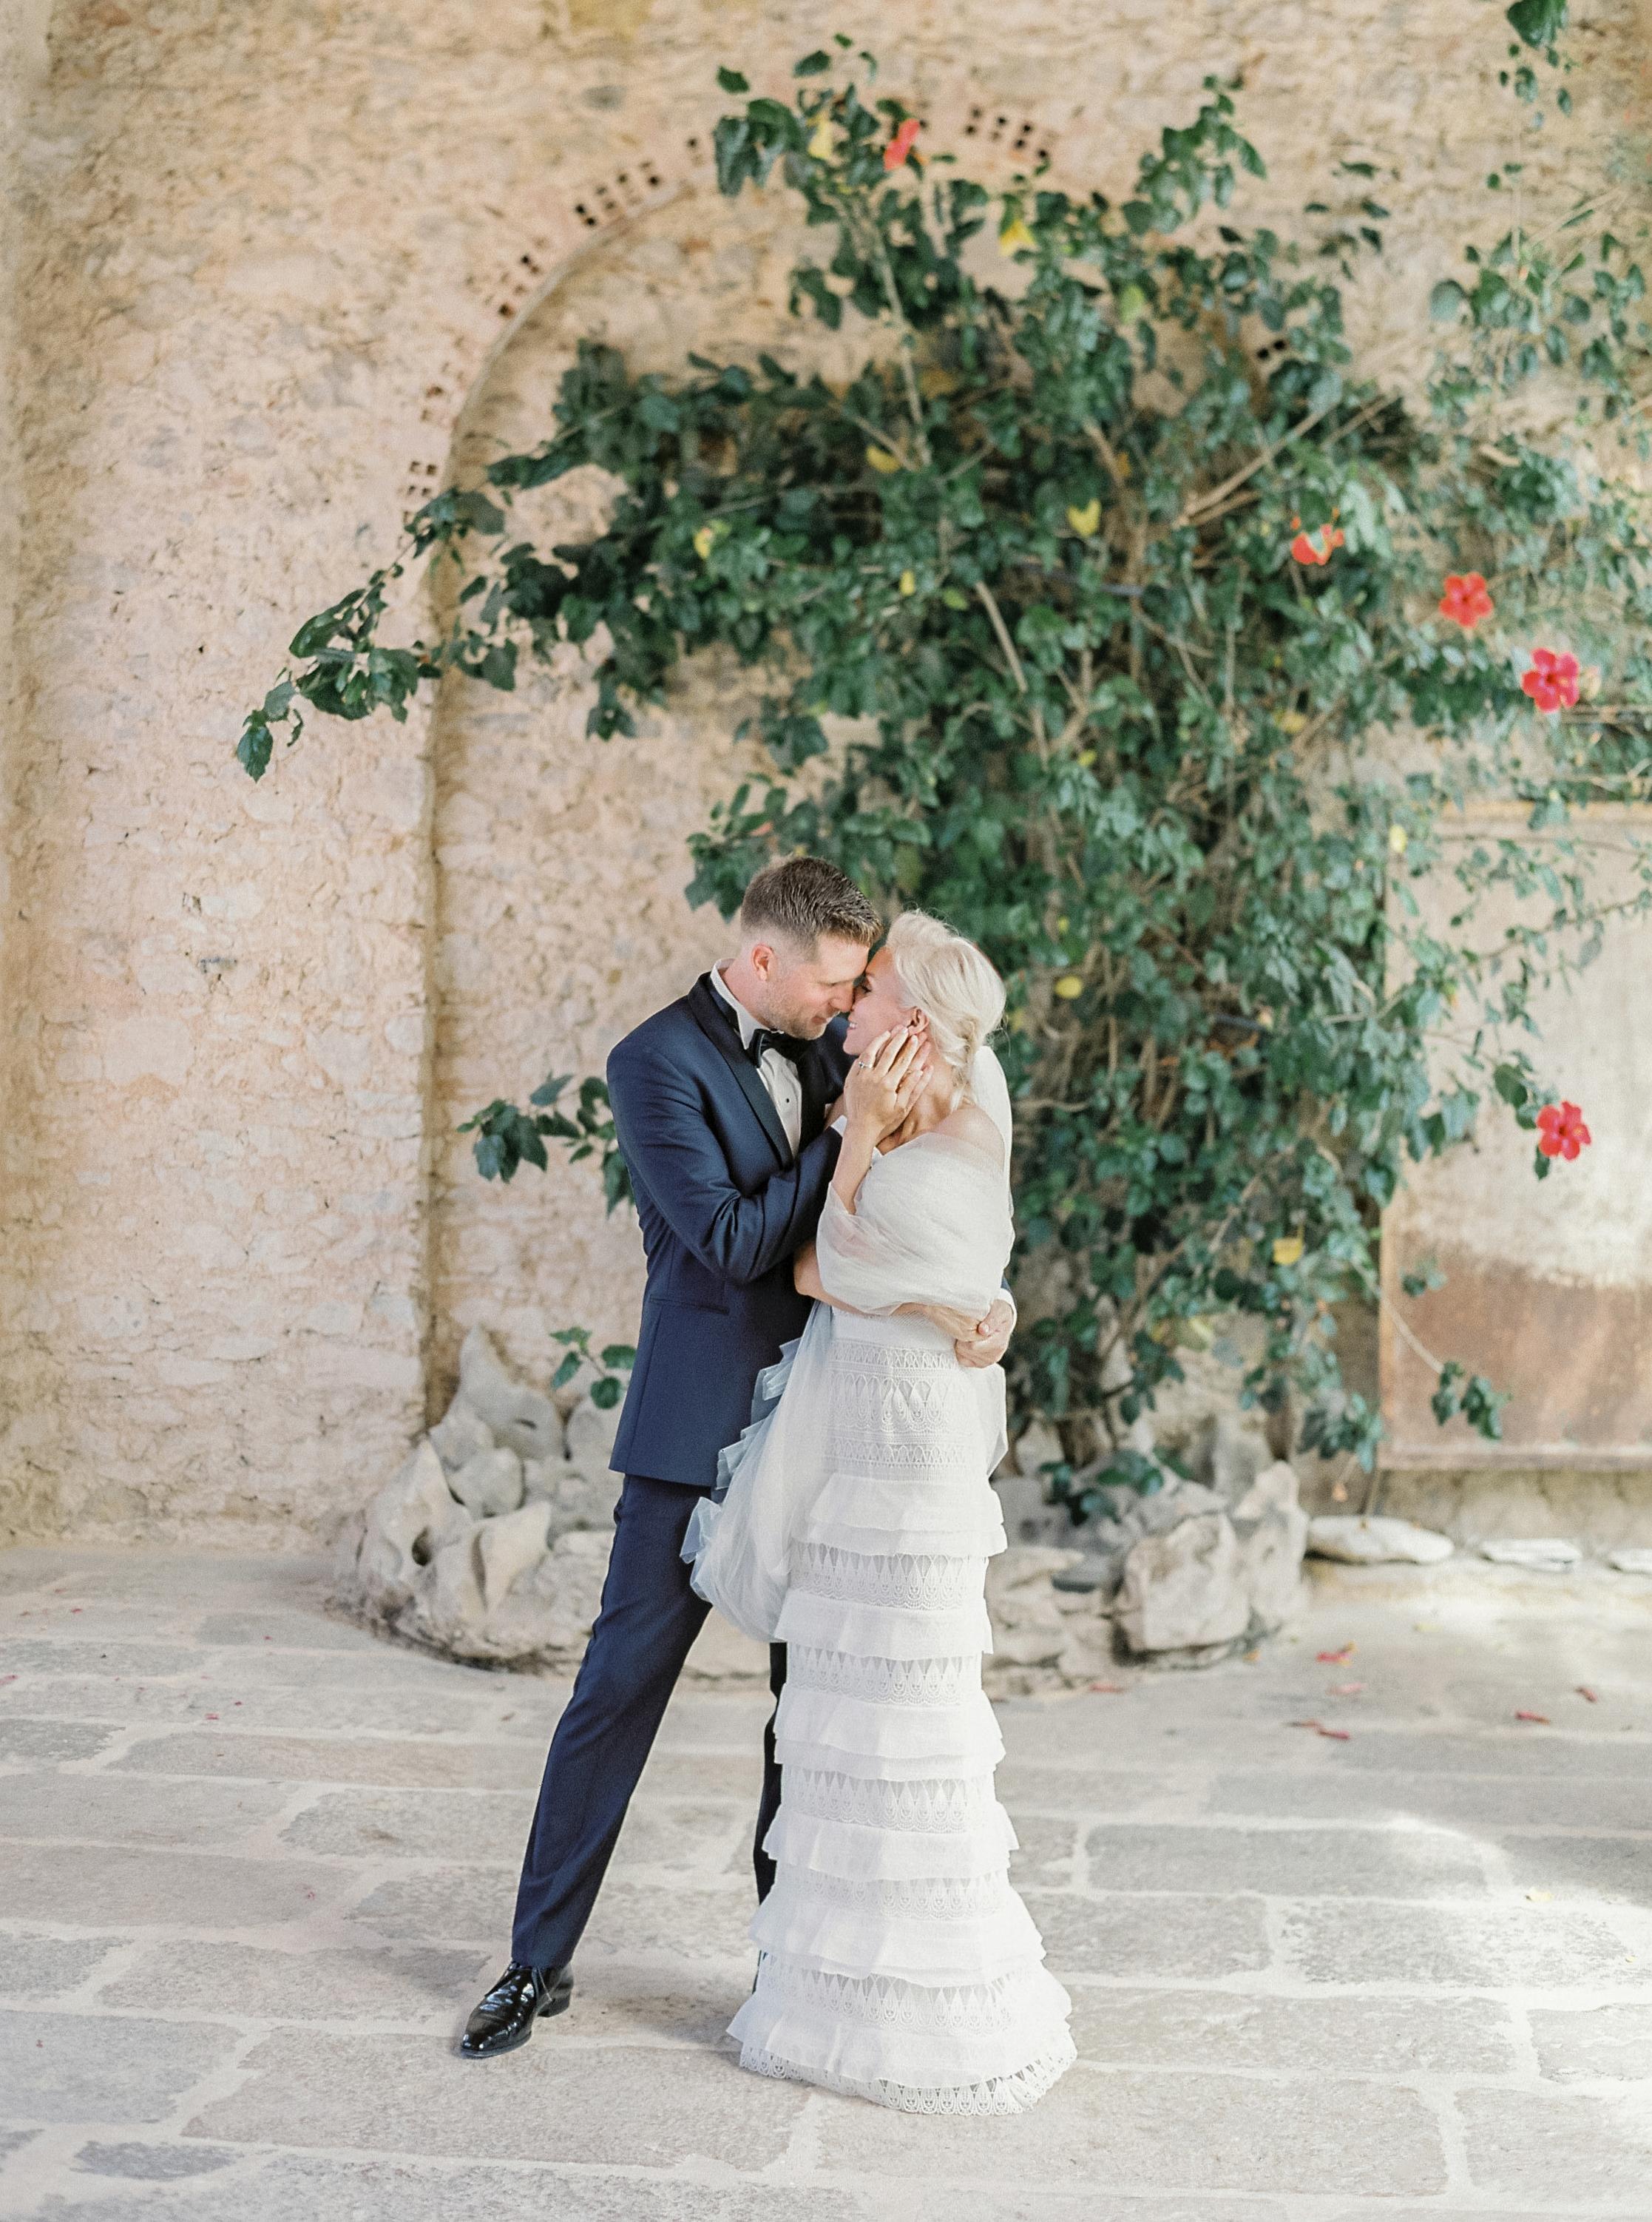 Nastia_Vesna_Photography_Wedding_Portugal_30.jpg